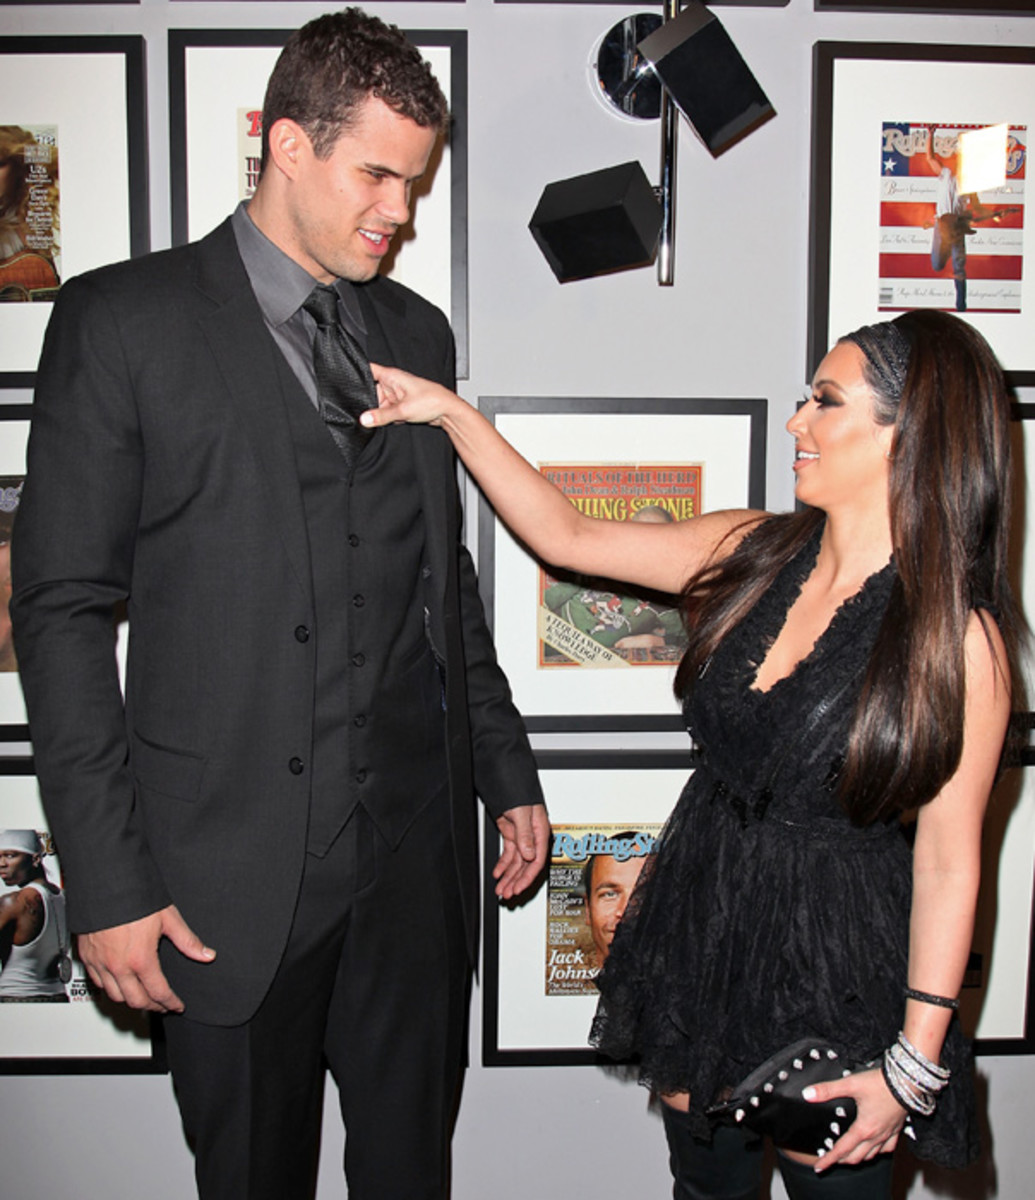 Kris Humphries and girlfriend Kim Kardashian